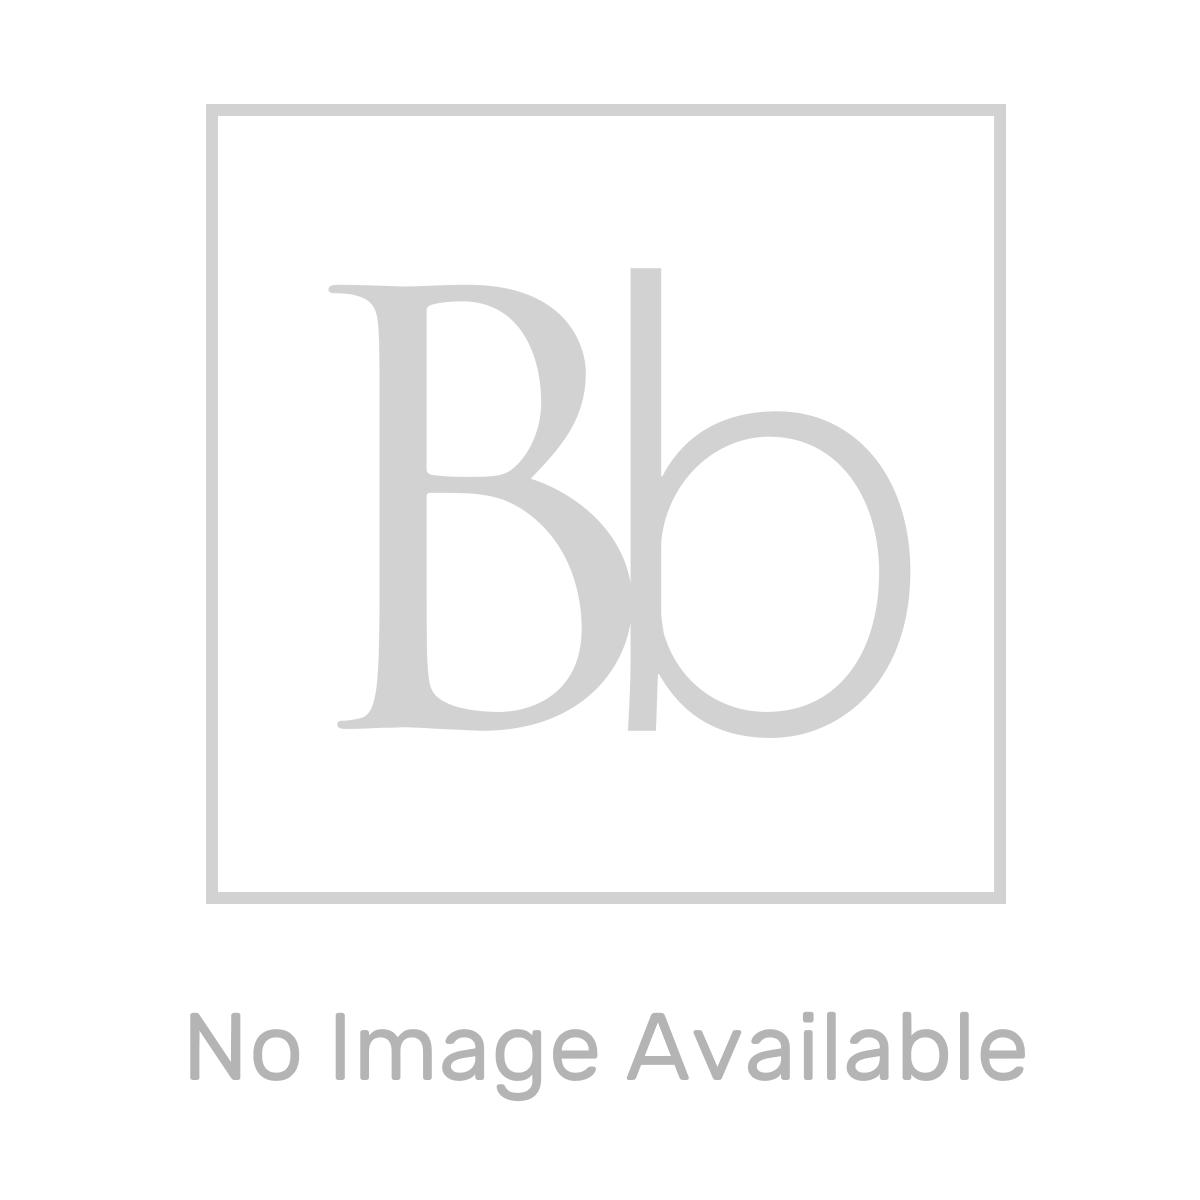 HiB Austin Single Door Illuminated Bathroom Mirrored Cabinet